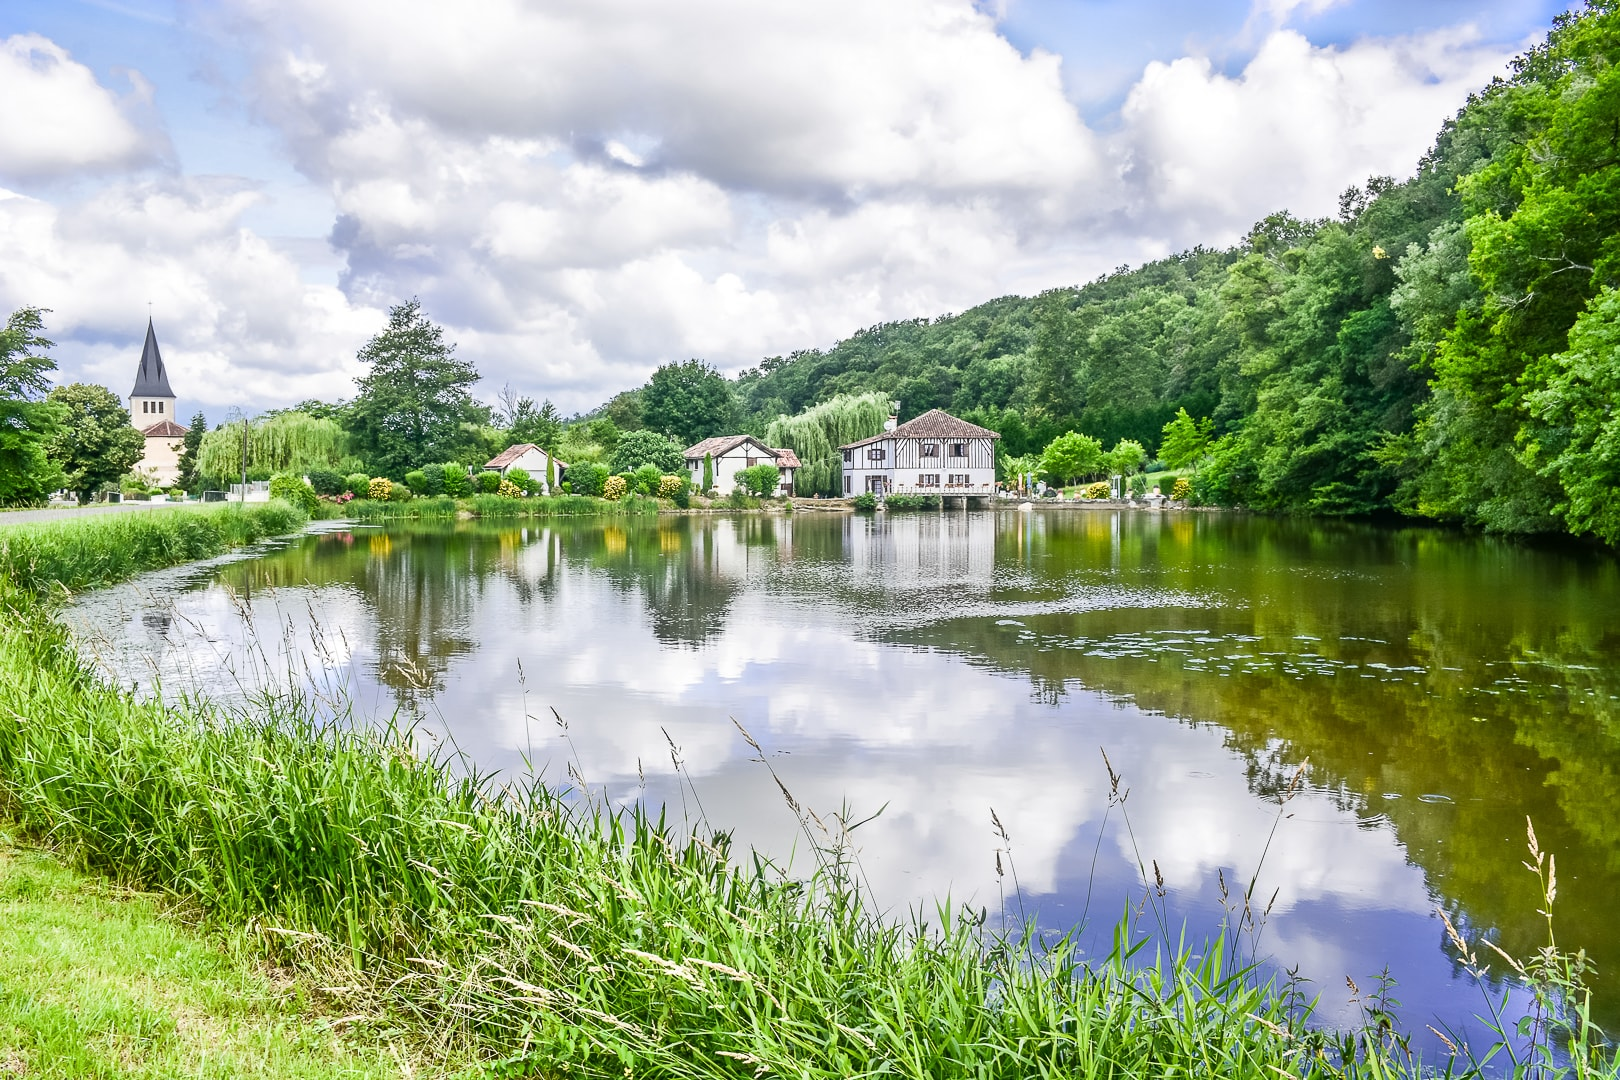 trezors-photography-photographe-professionnel-toulouse-31-voyage-paysage-moulin